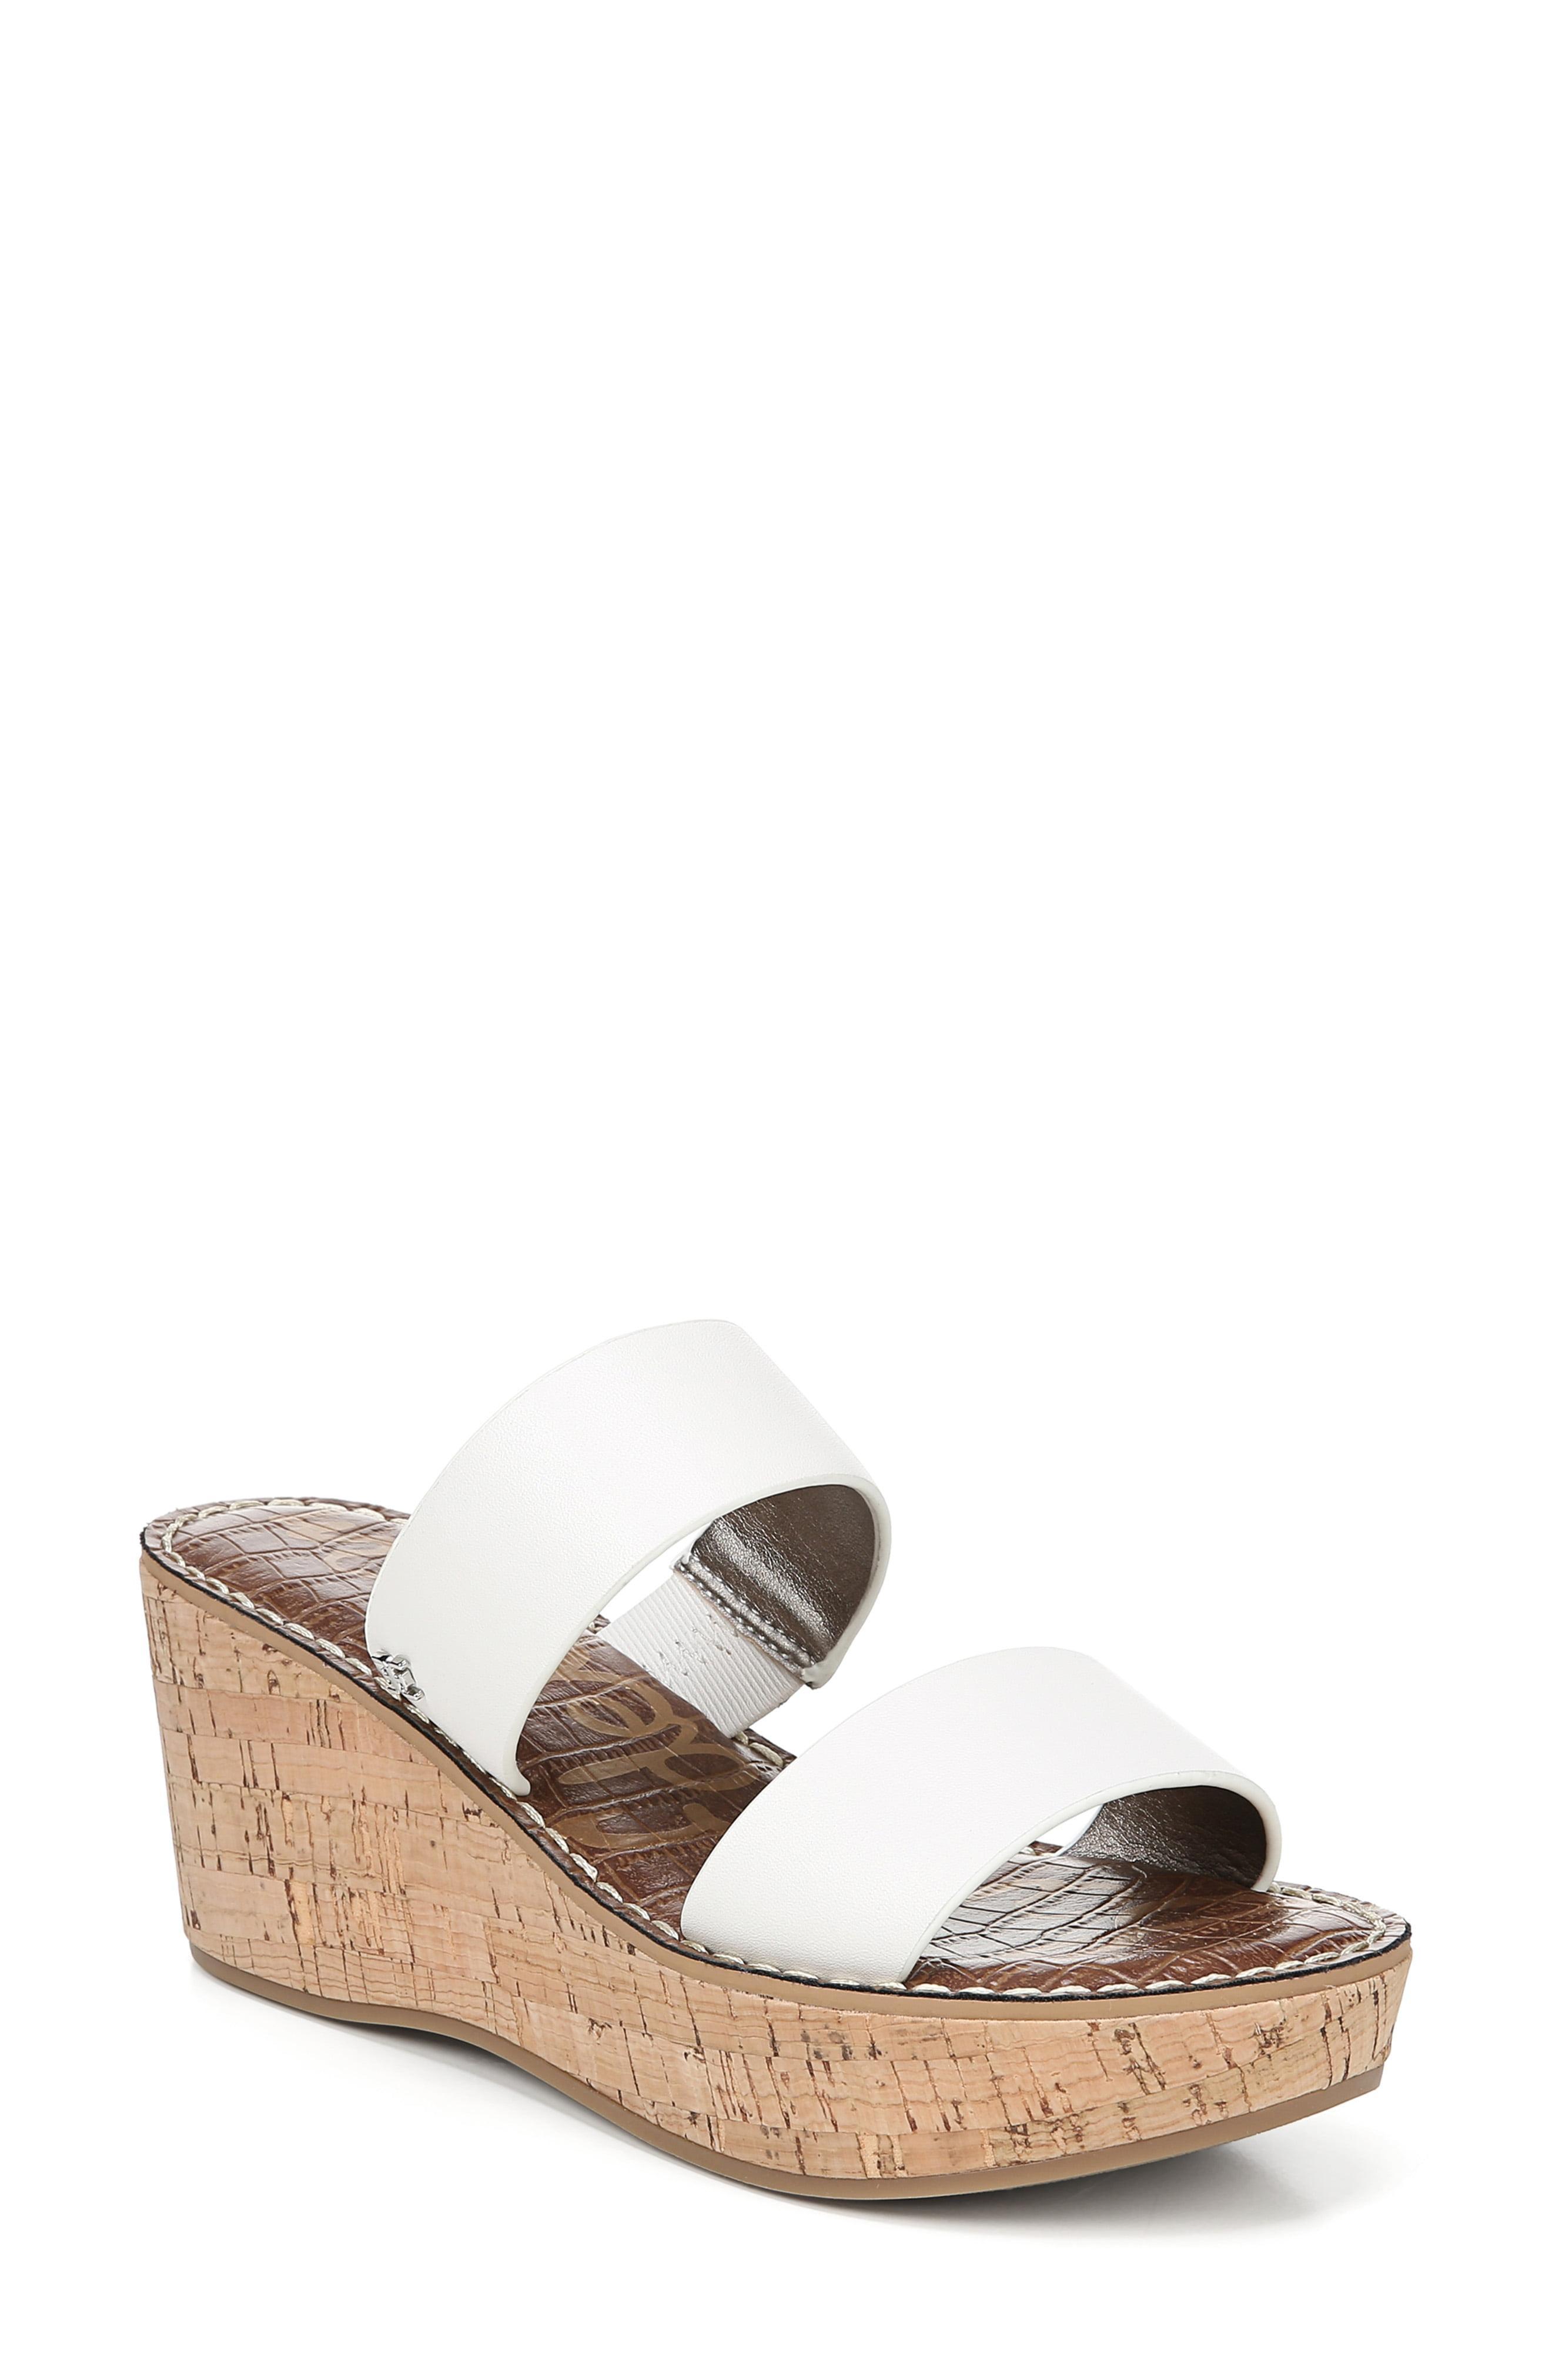 2e434a50be7 Lyst - Sam Edelman Women s Rydell Cork Wedge Heel Sandals in White ...